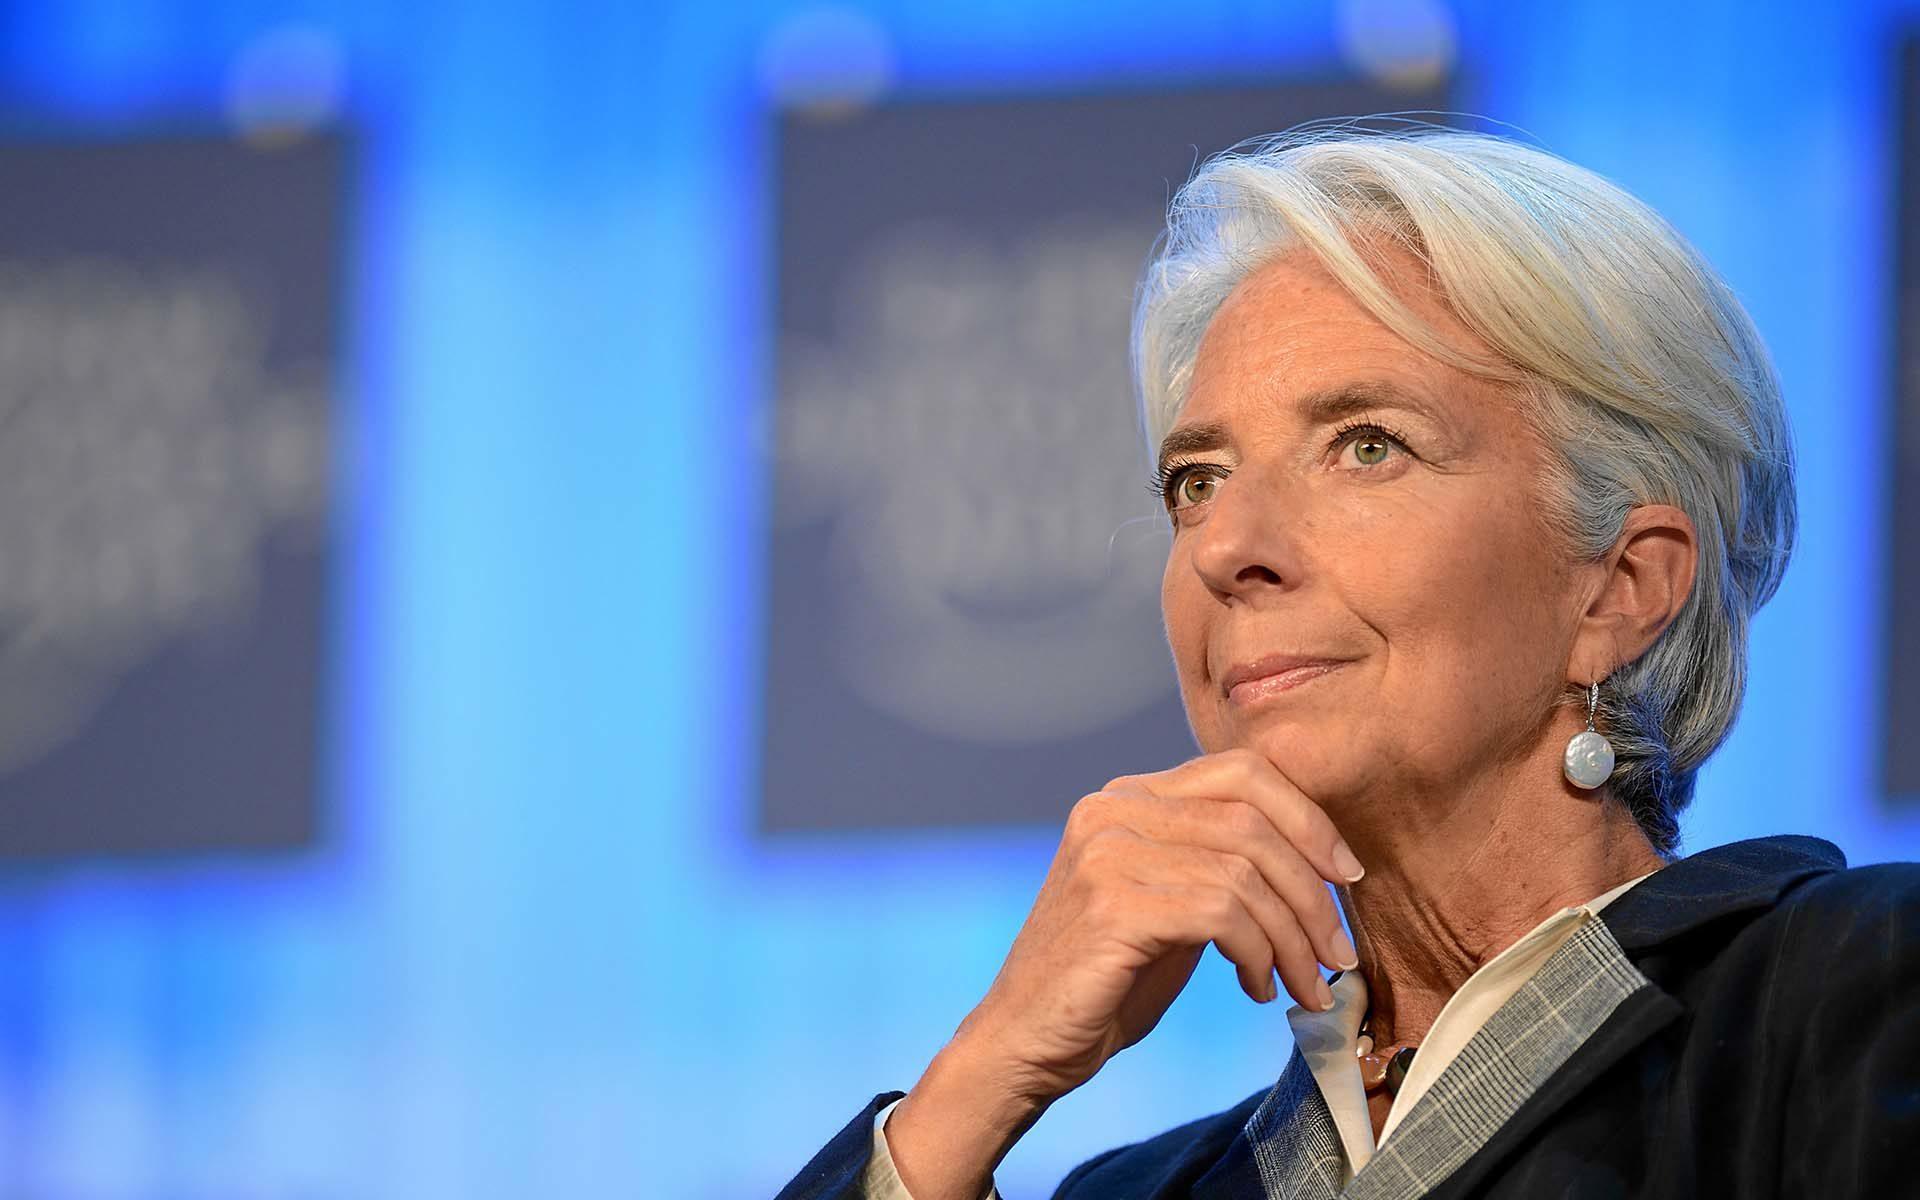 IMF Chief Christine Lagarde Calls for Digital Currencies